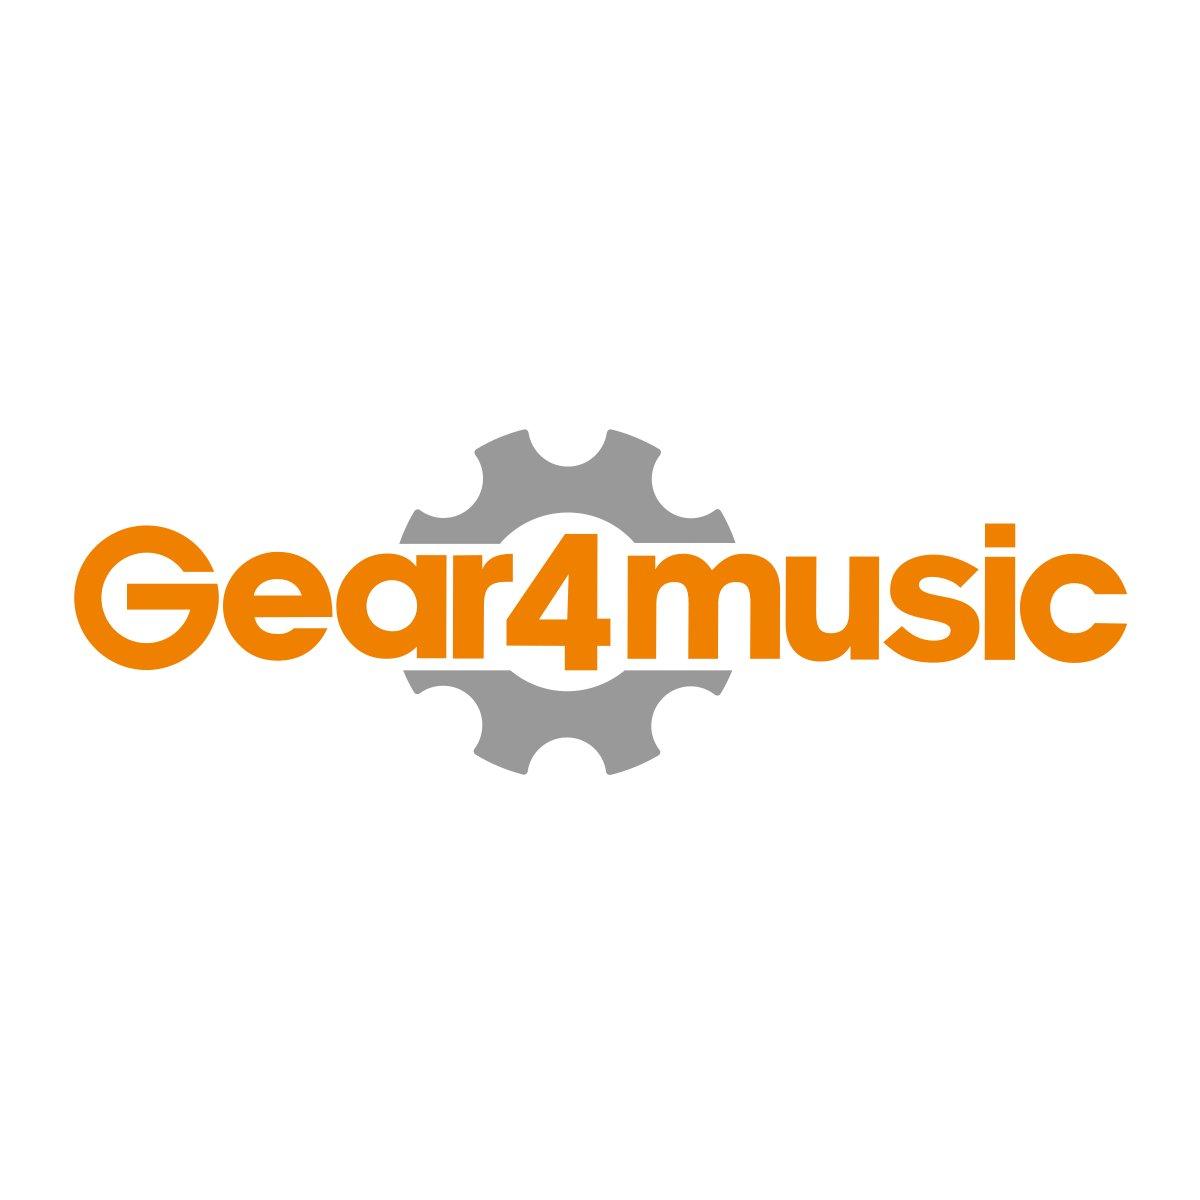 Junior Trommesæt med 5 dele fra Gear4music, Blå